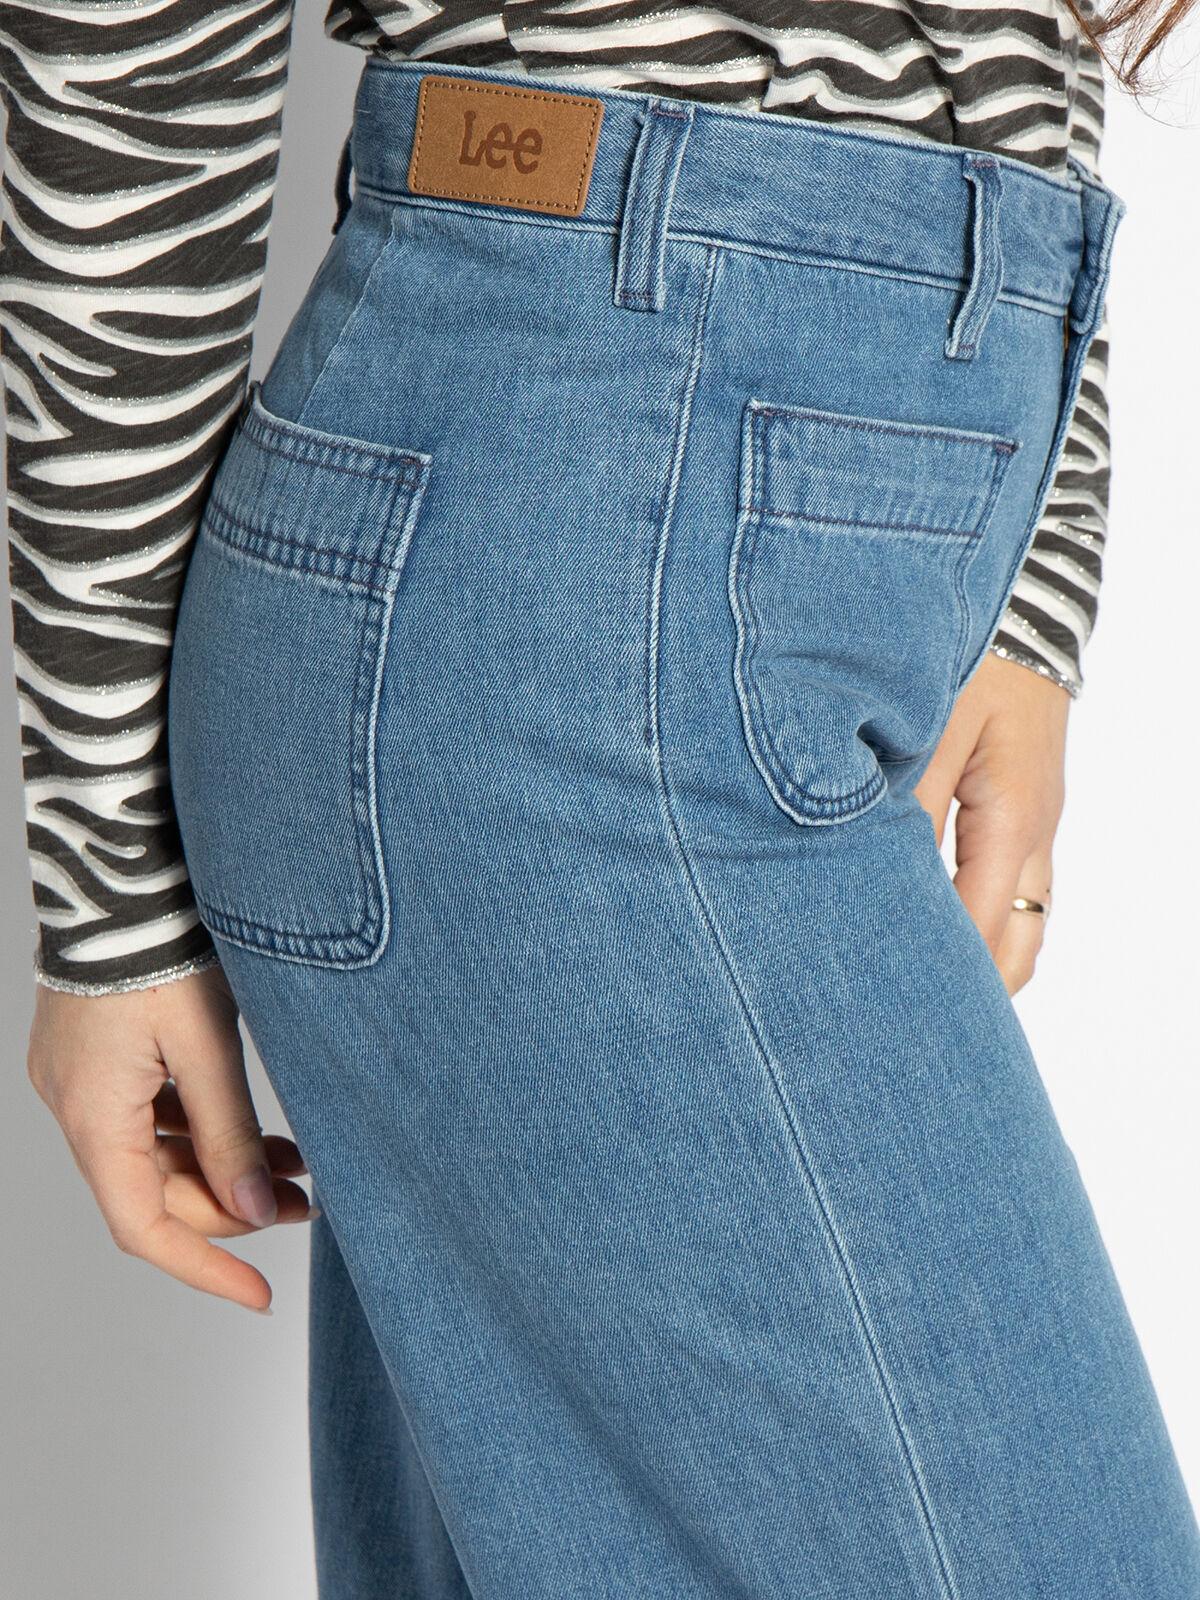 Boyfriend Jeans